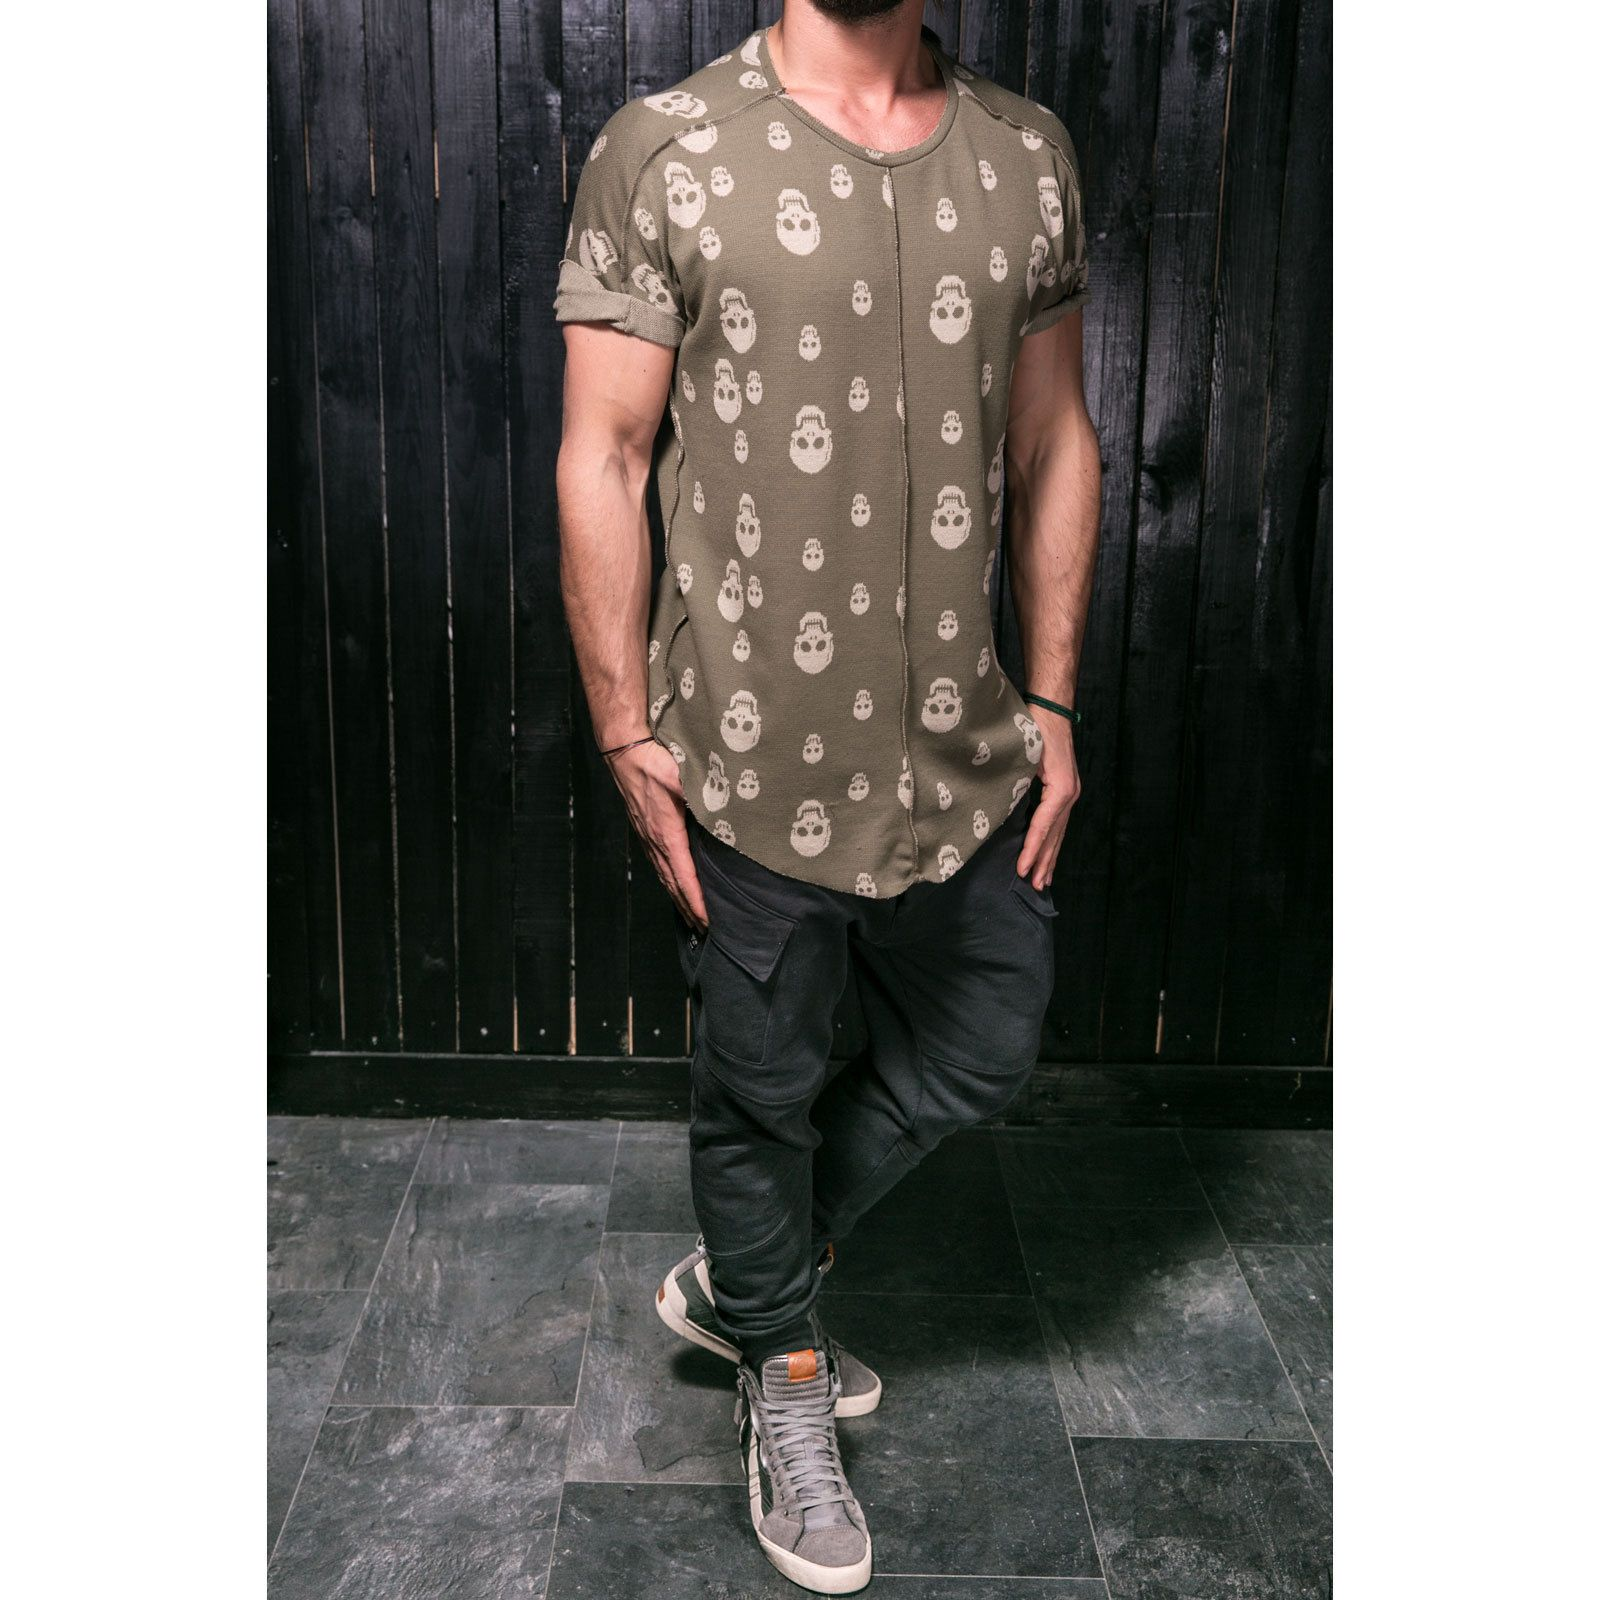 Men's T-Shirt Street Fashion Oversized Fit Soft Fabric Reverse Skulls Print 2064 | eBay